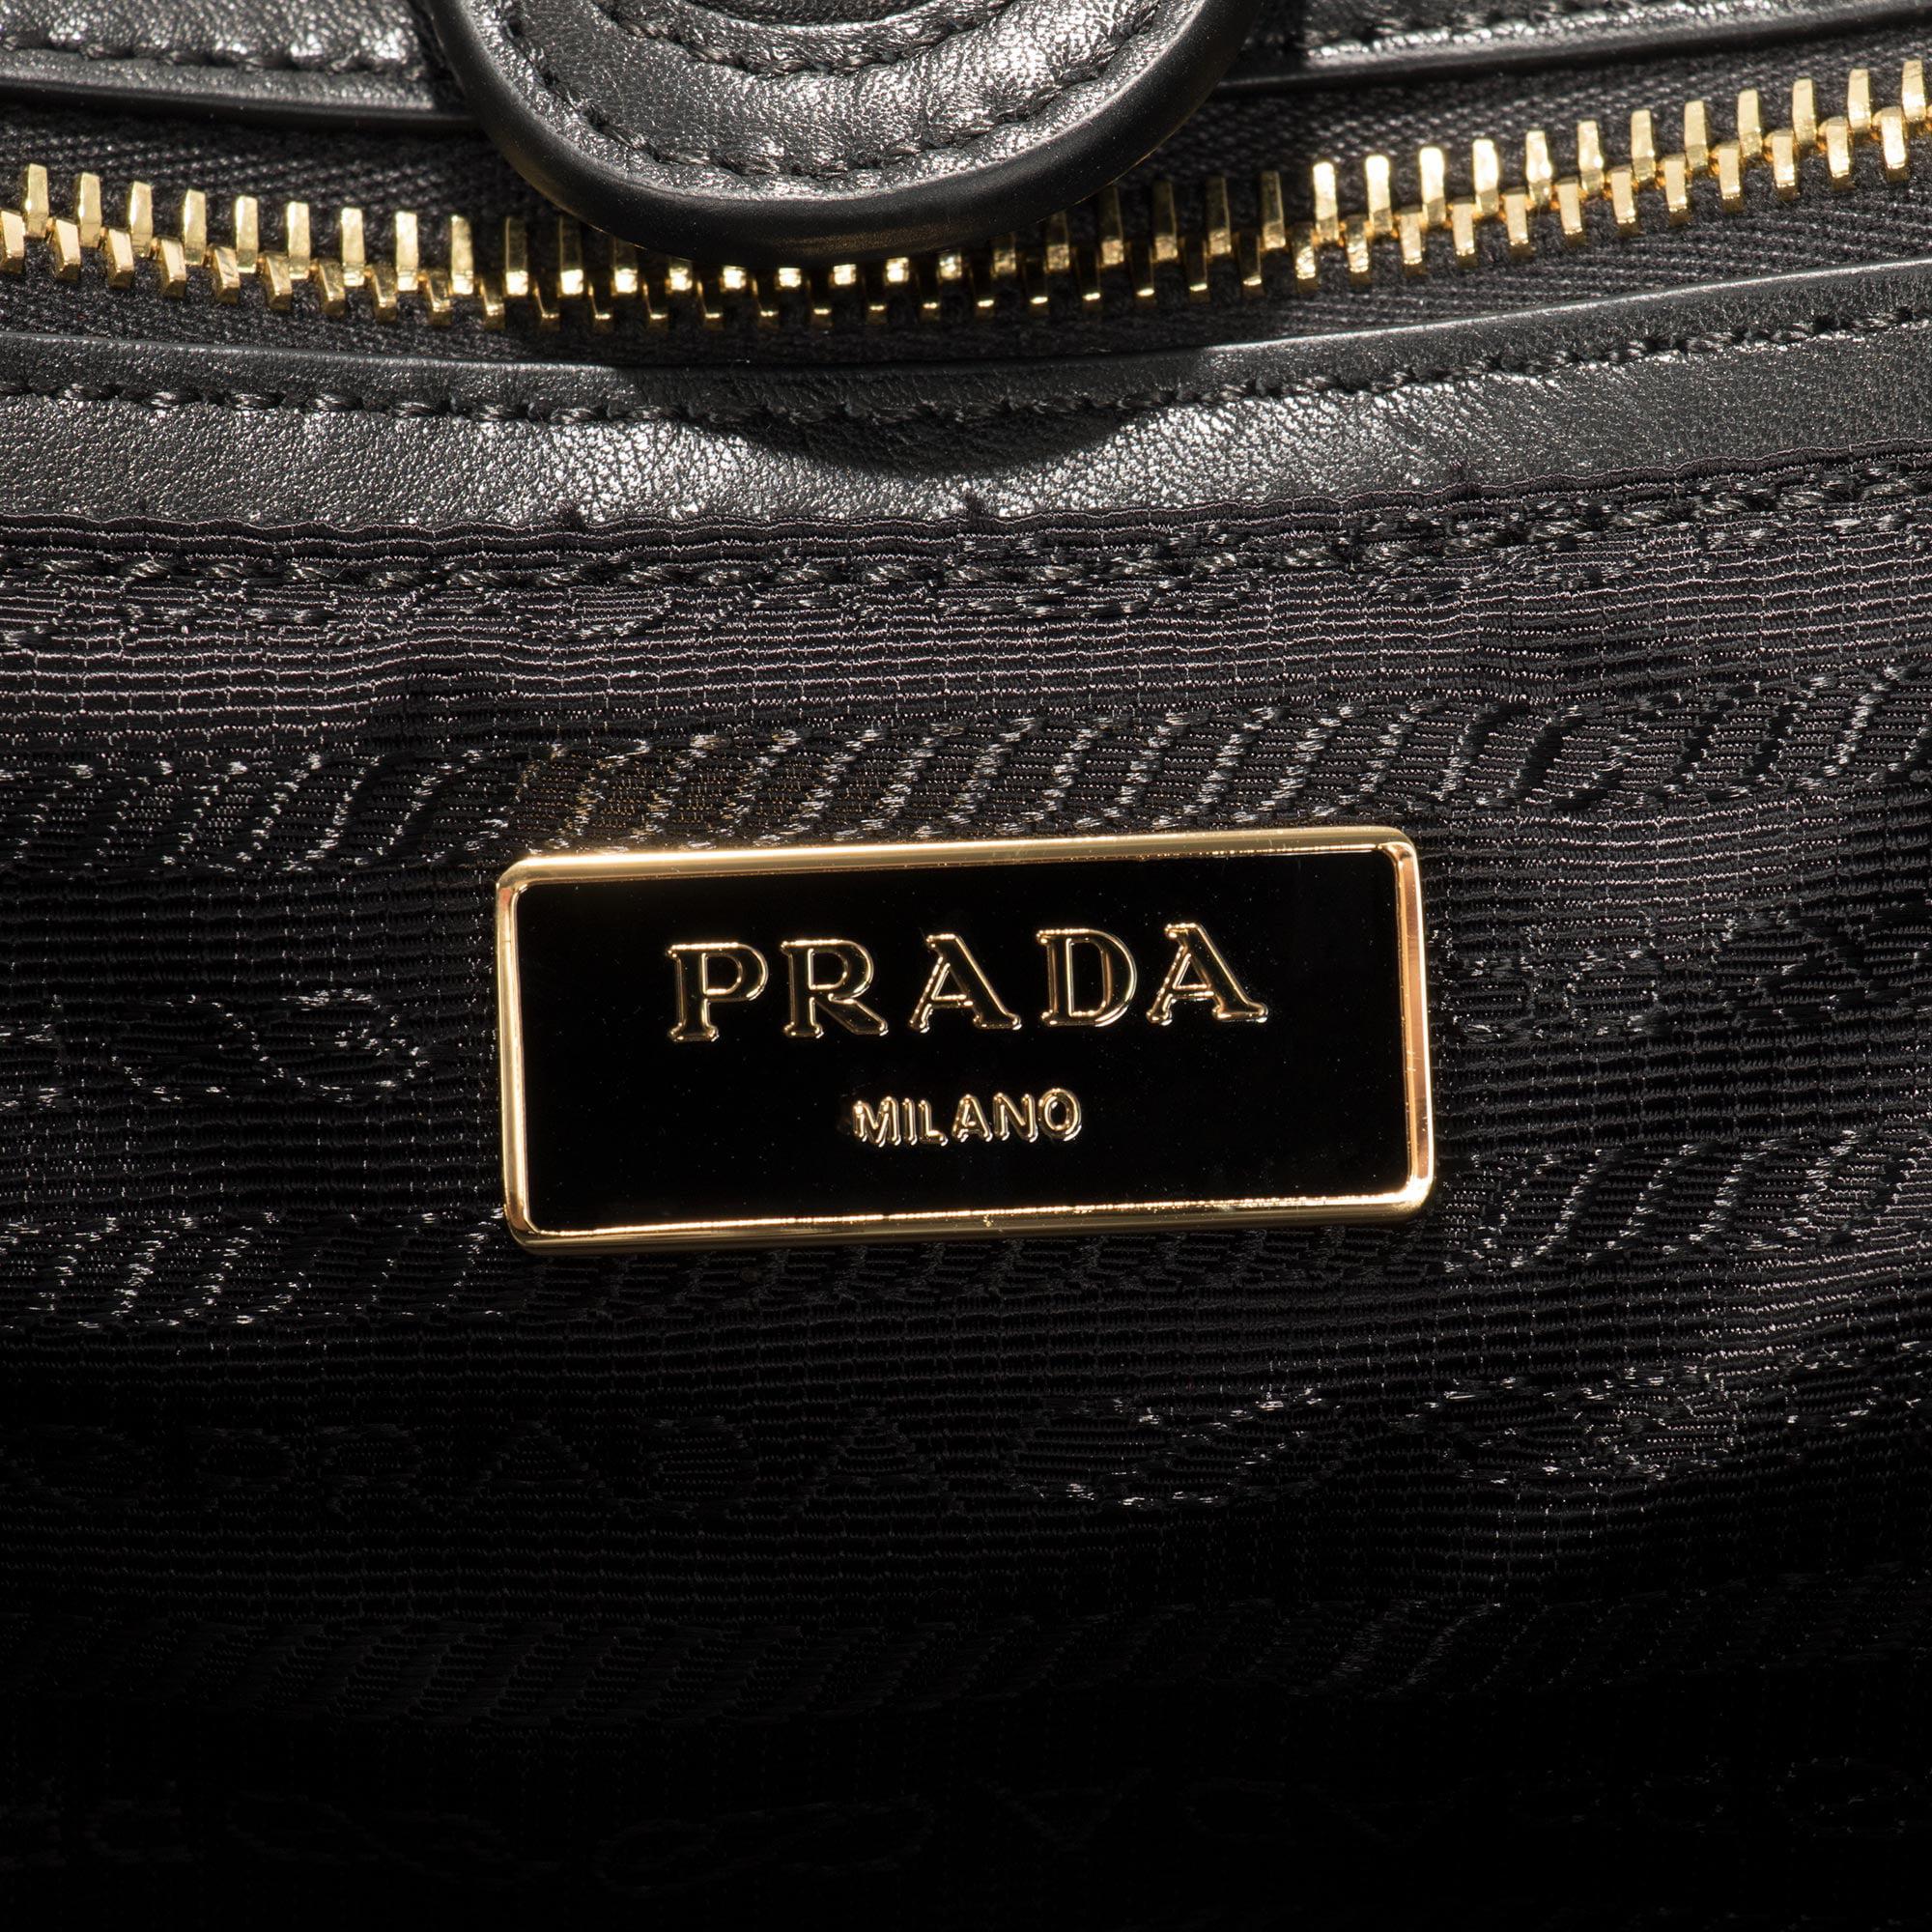 b174b34449 Prada Gaufre Fabric Handbag in Black - Walmart.com